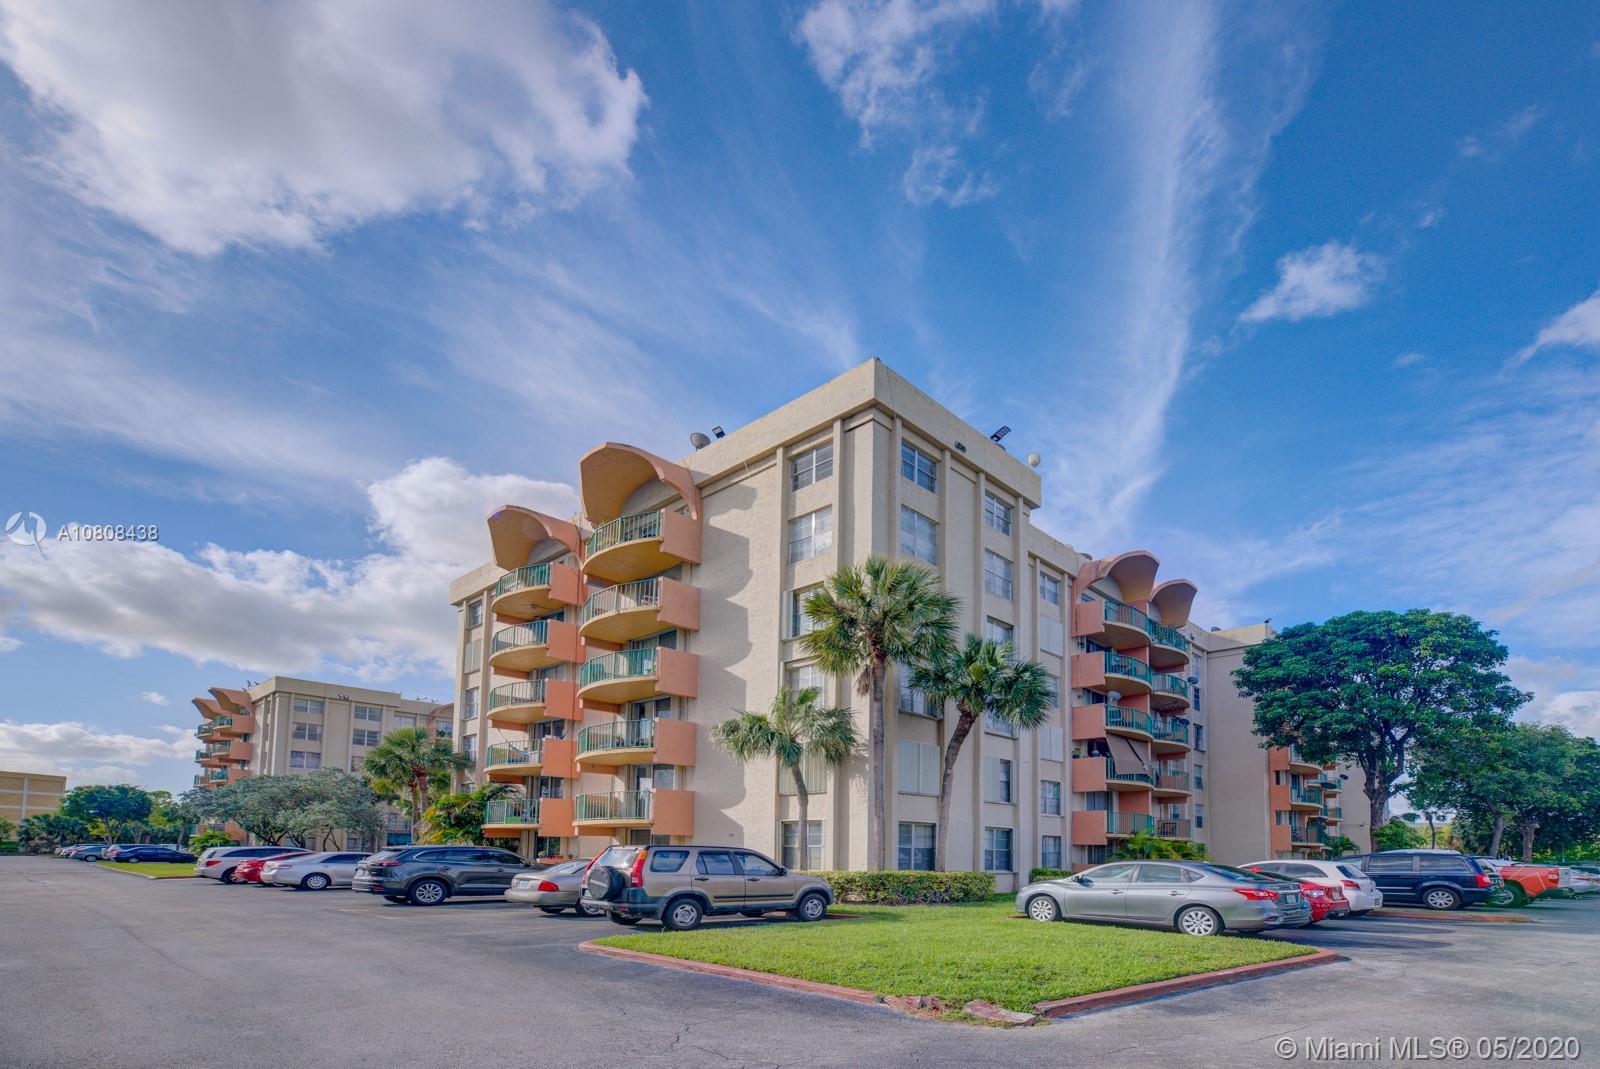 9320 Fontainebleau Blvd 211, Miami, FL 33172